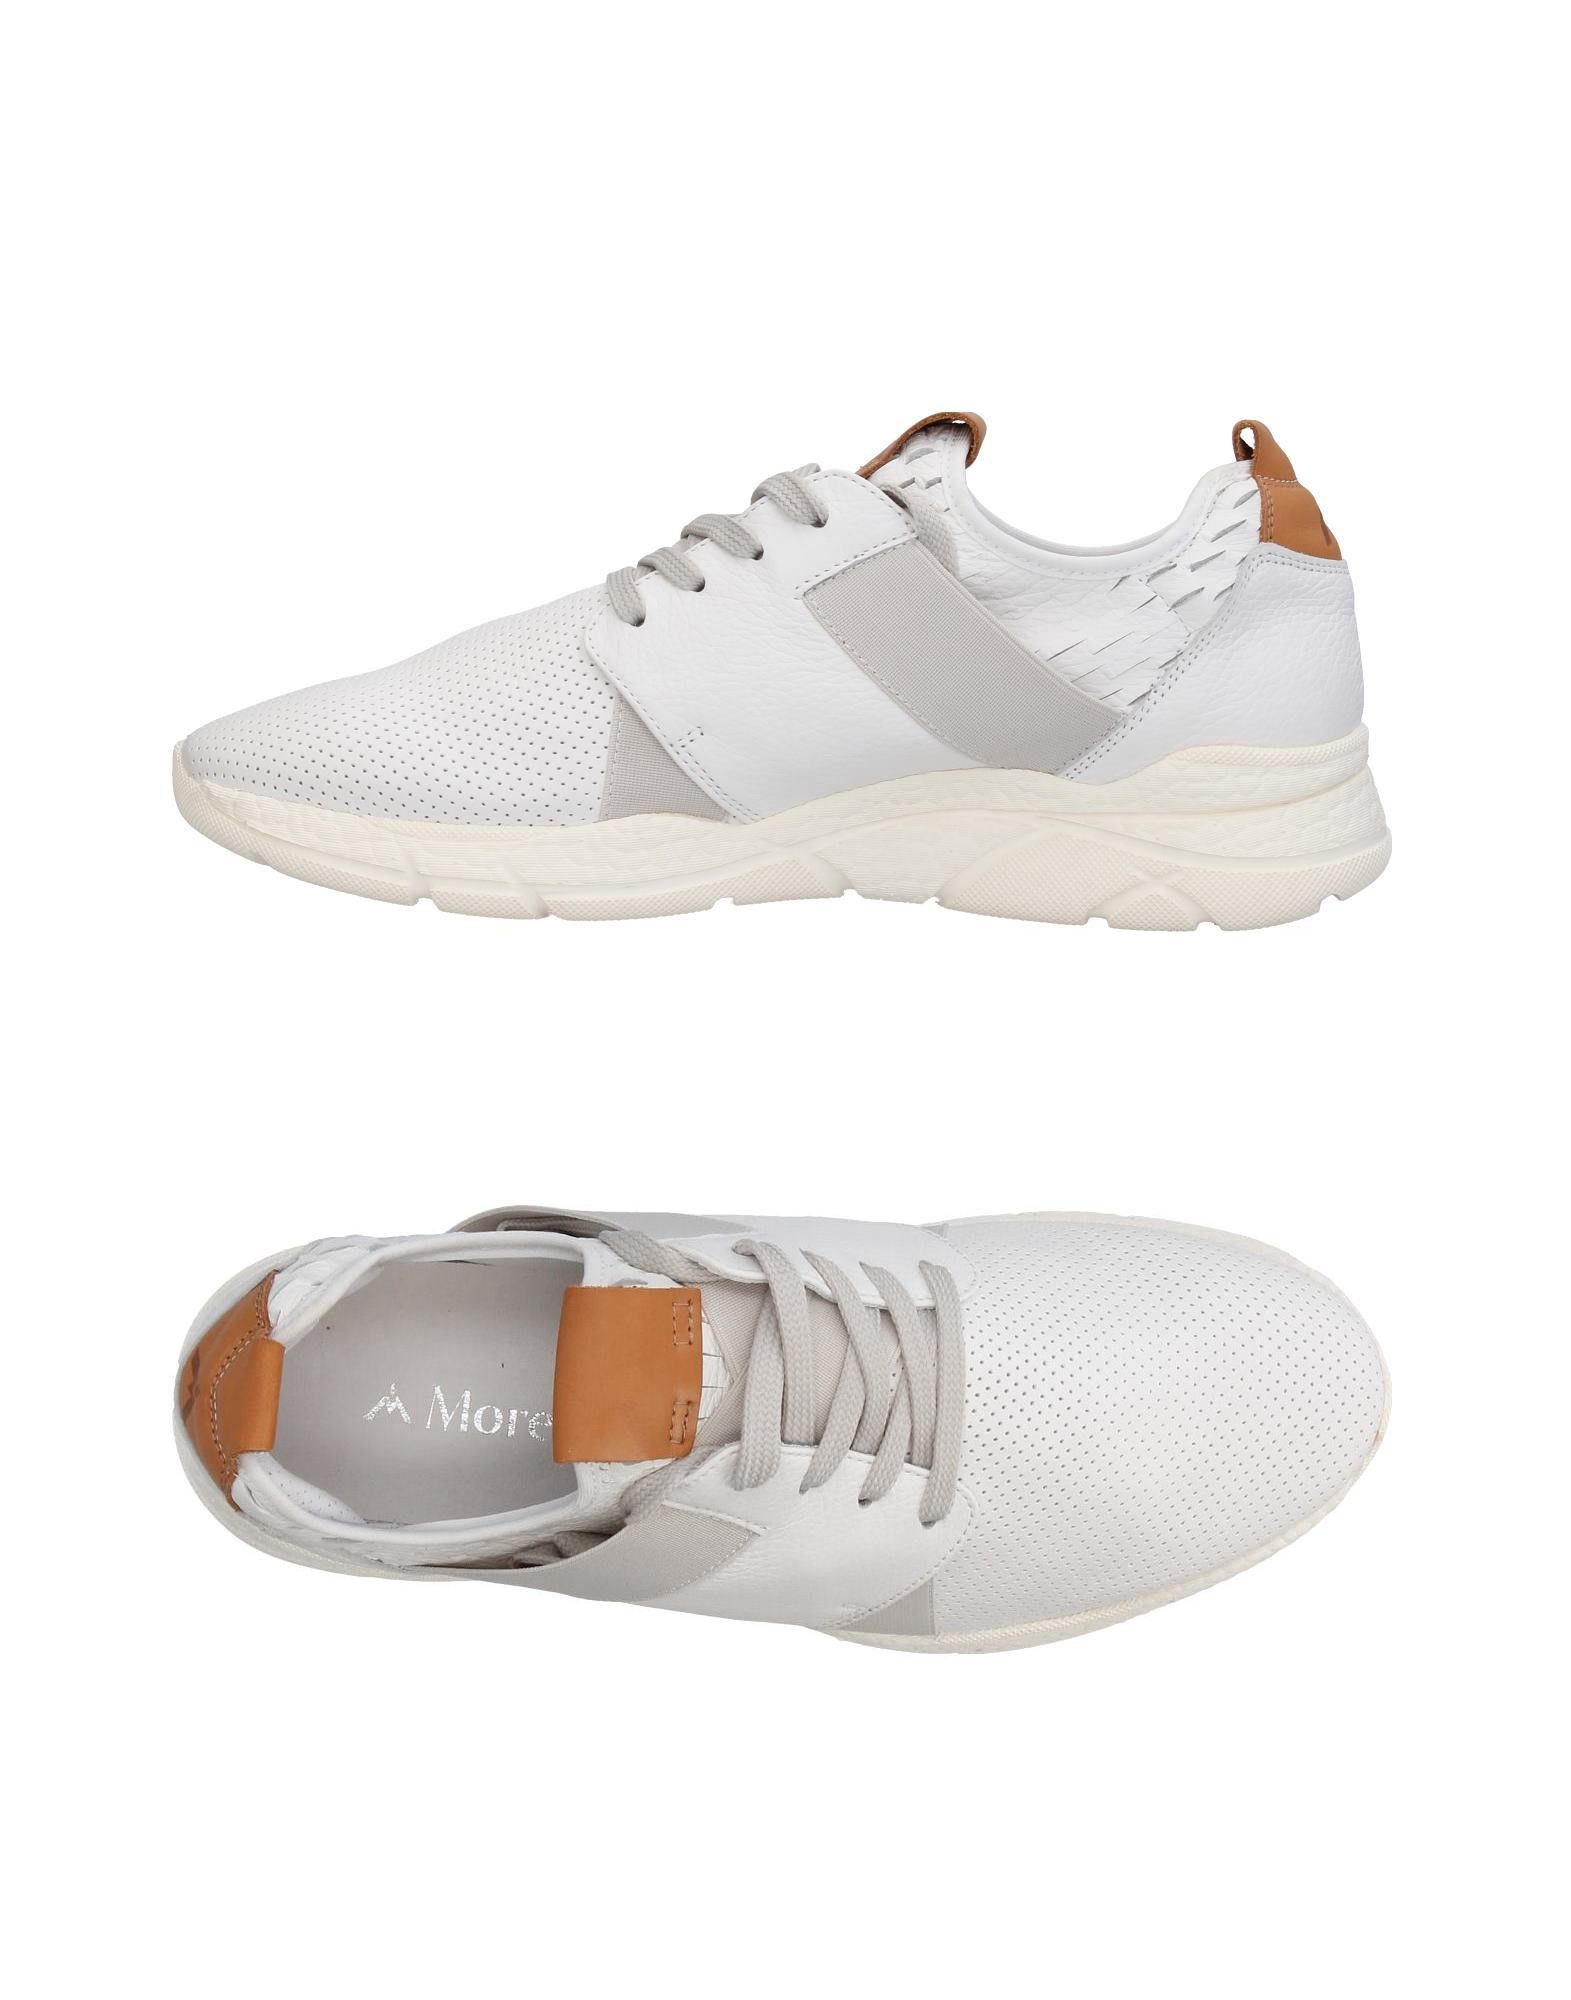 Sneakers Andrea Morelli Uomo - 11388012GI